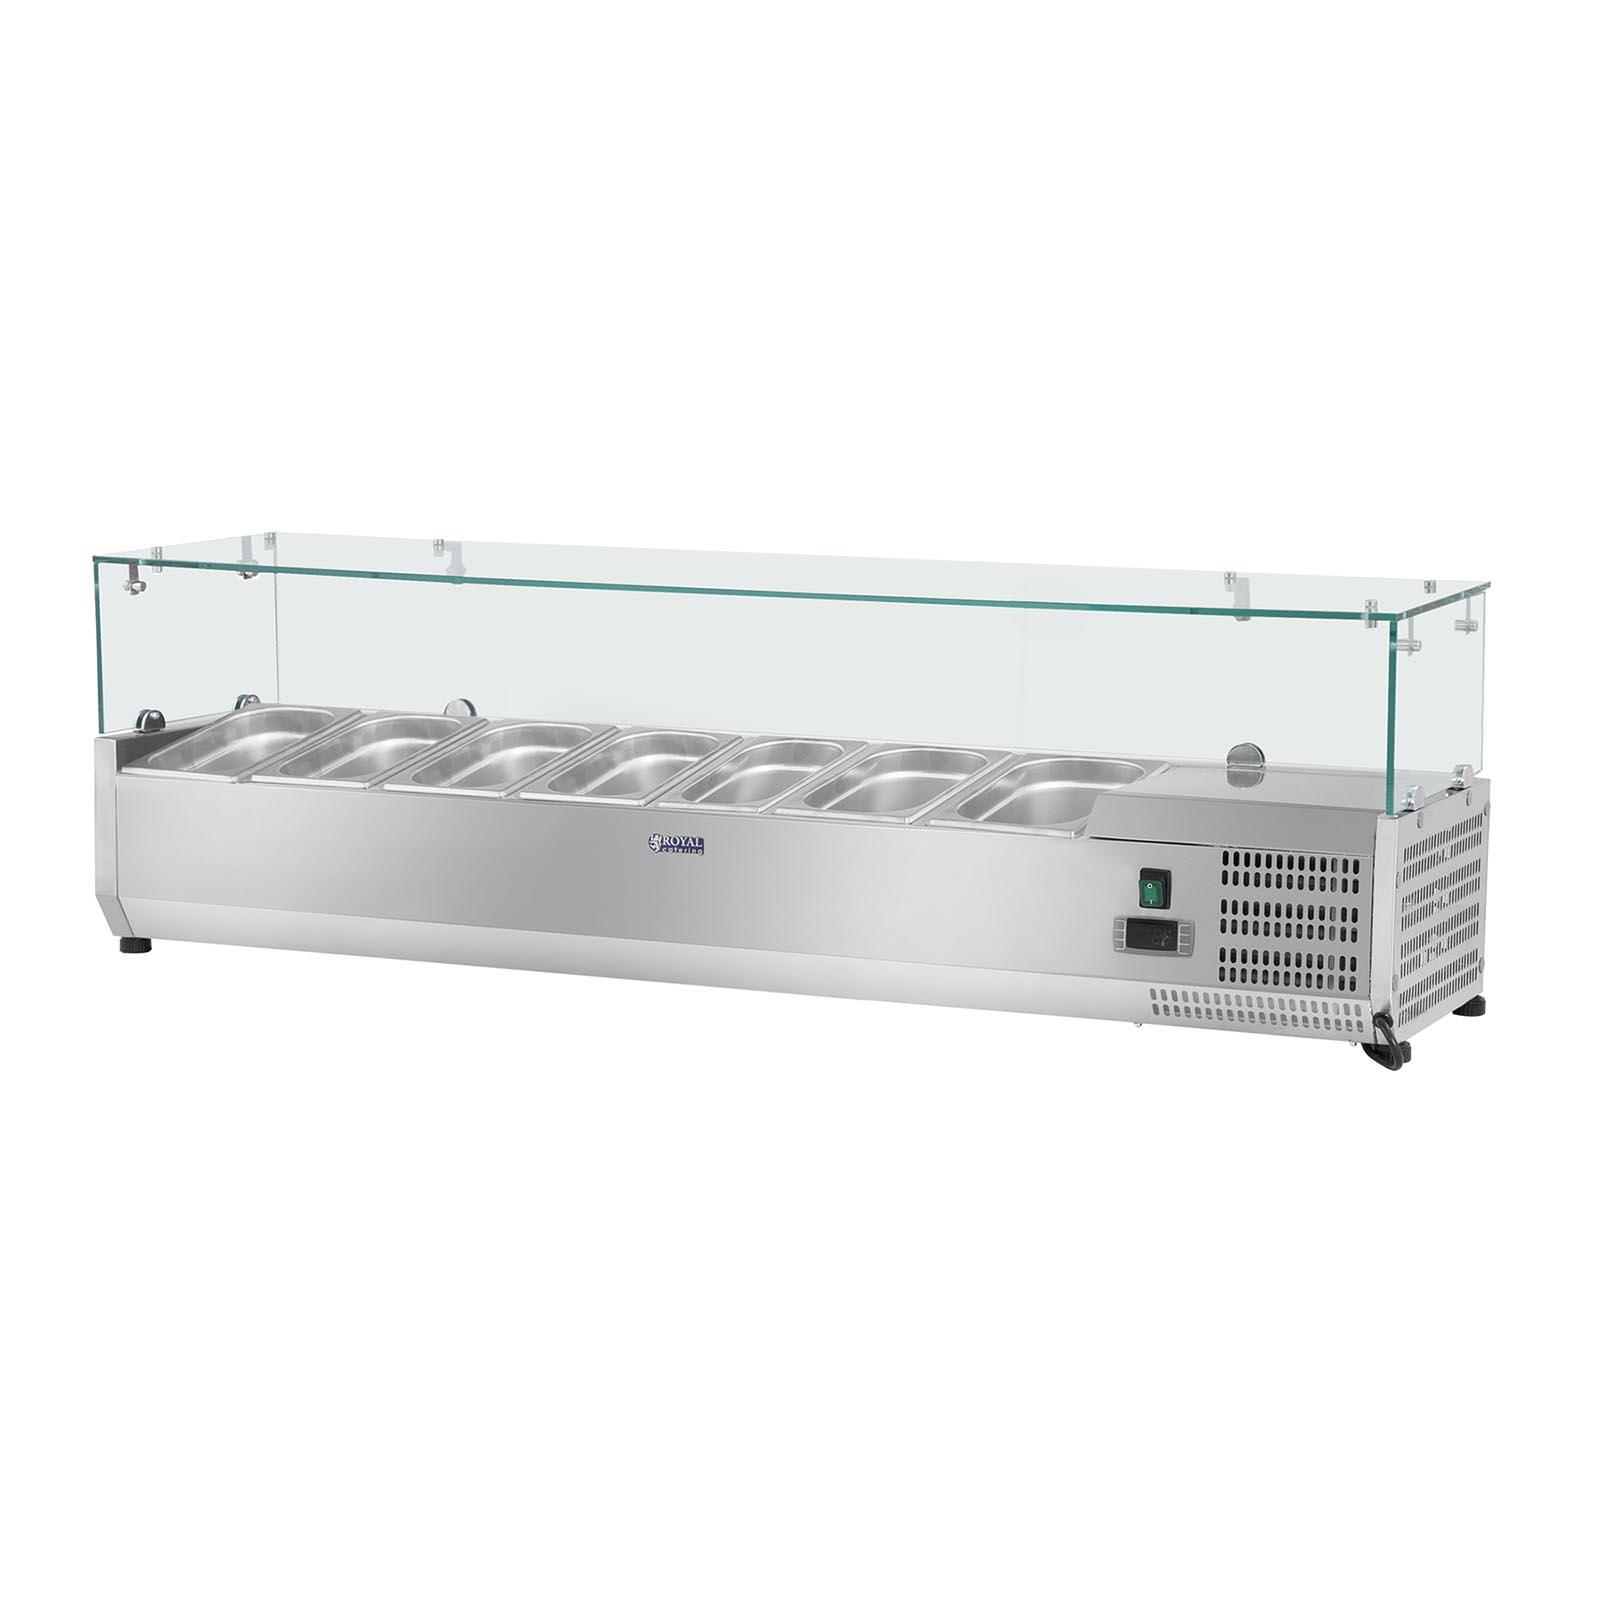 Chladiaca nadstavba - 150 x 33 cm - 7 GN nádob 14 - sklenený zákryt - 1